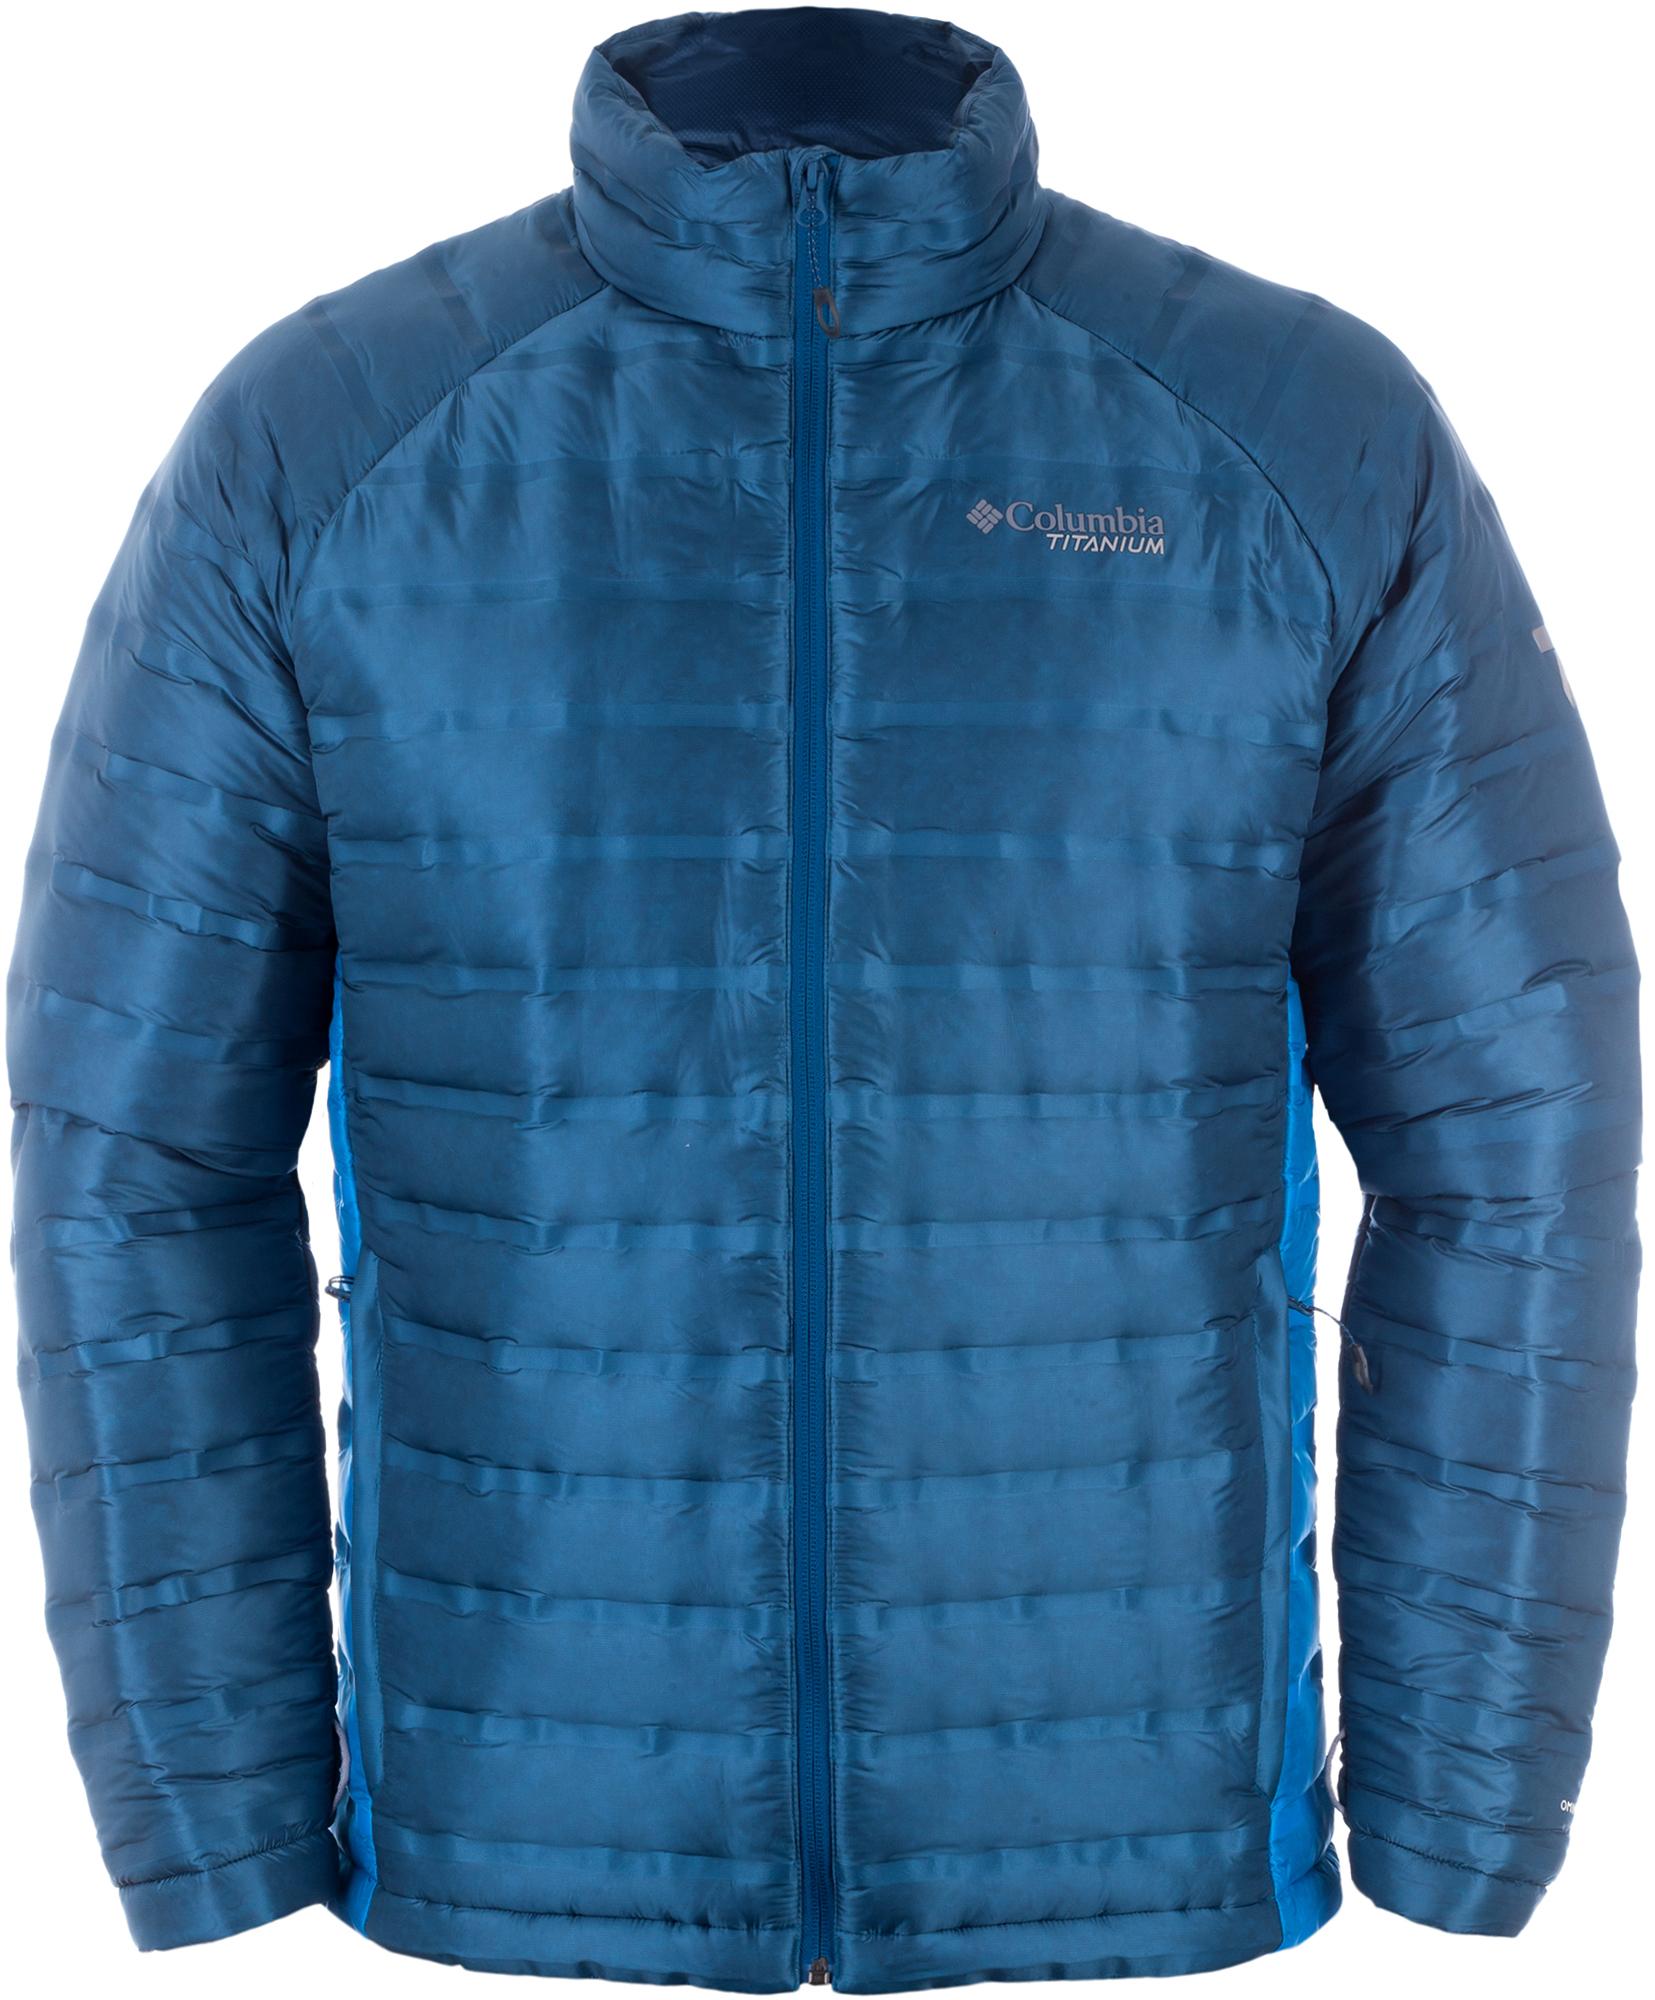 Columbia Куртка пуховая мужская Columbia Titan Ridge columbia рубашка с длинным рукавом мужская columbia boulder ridge